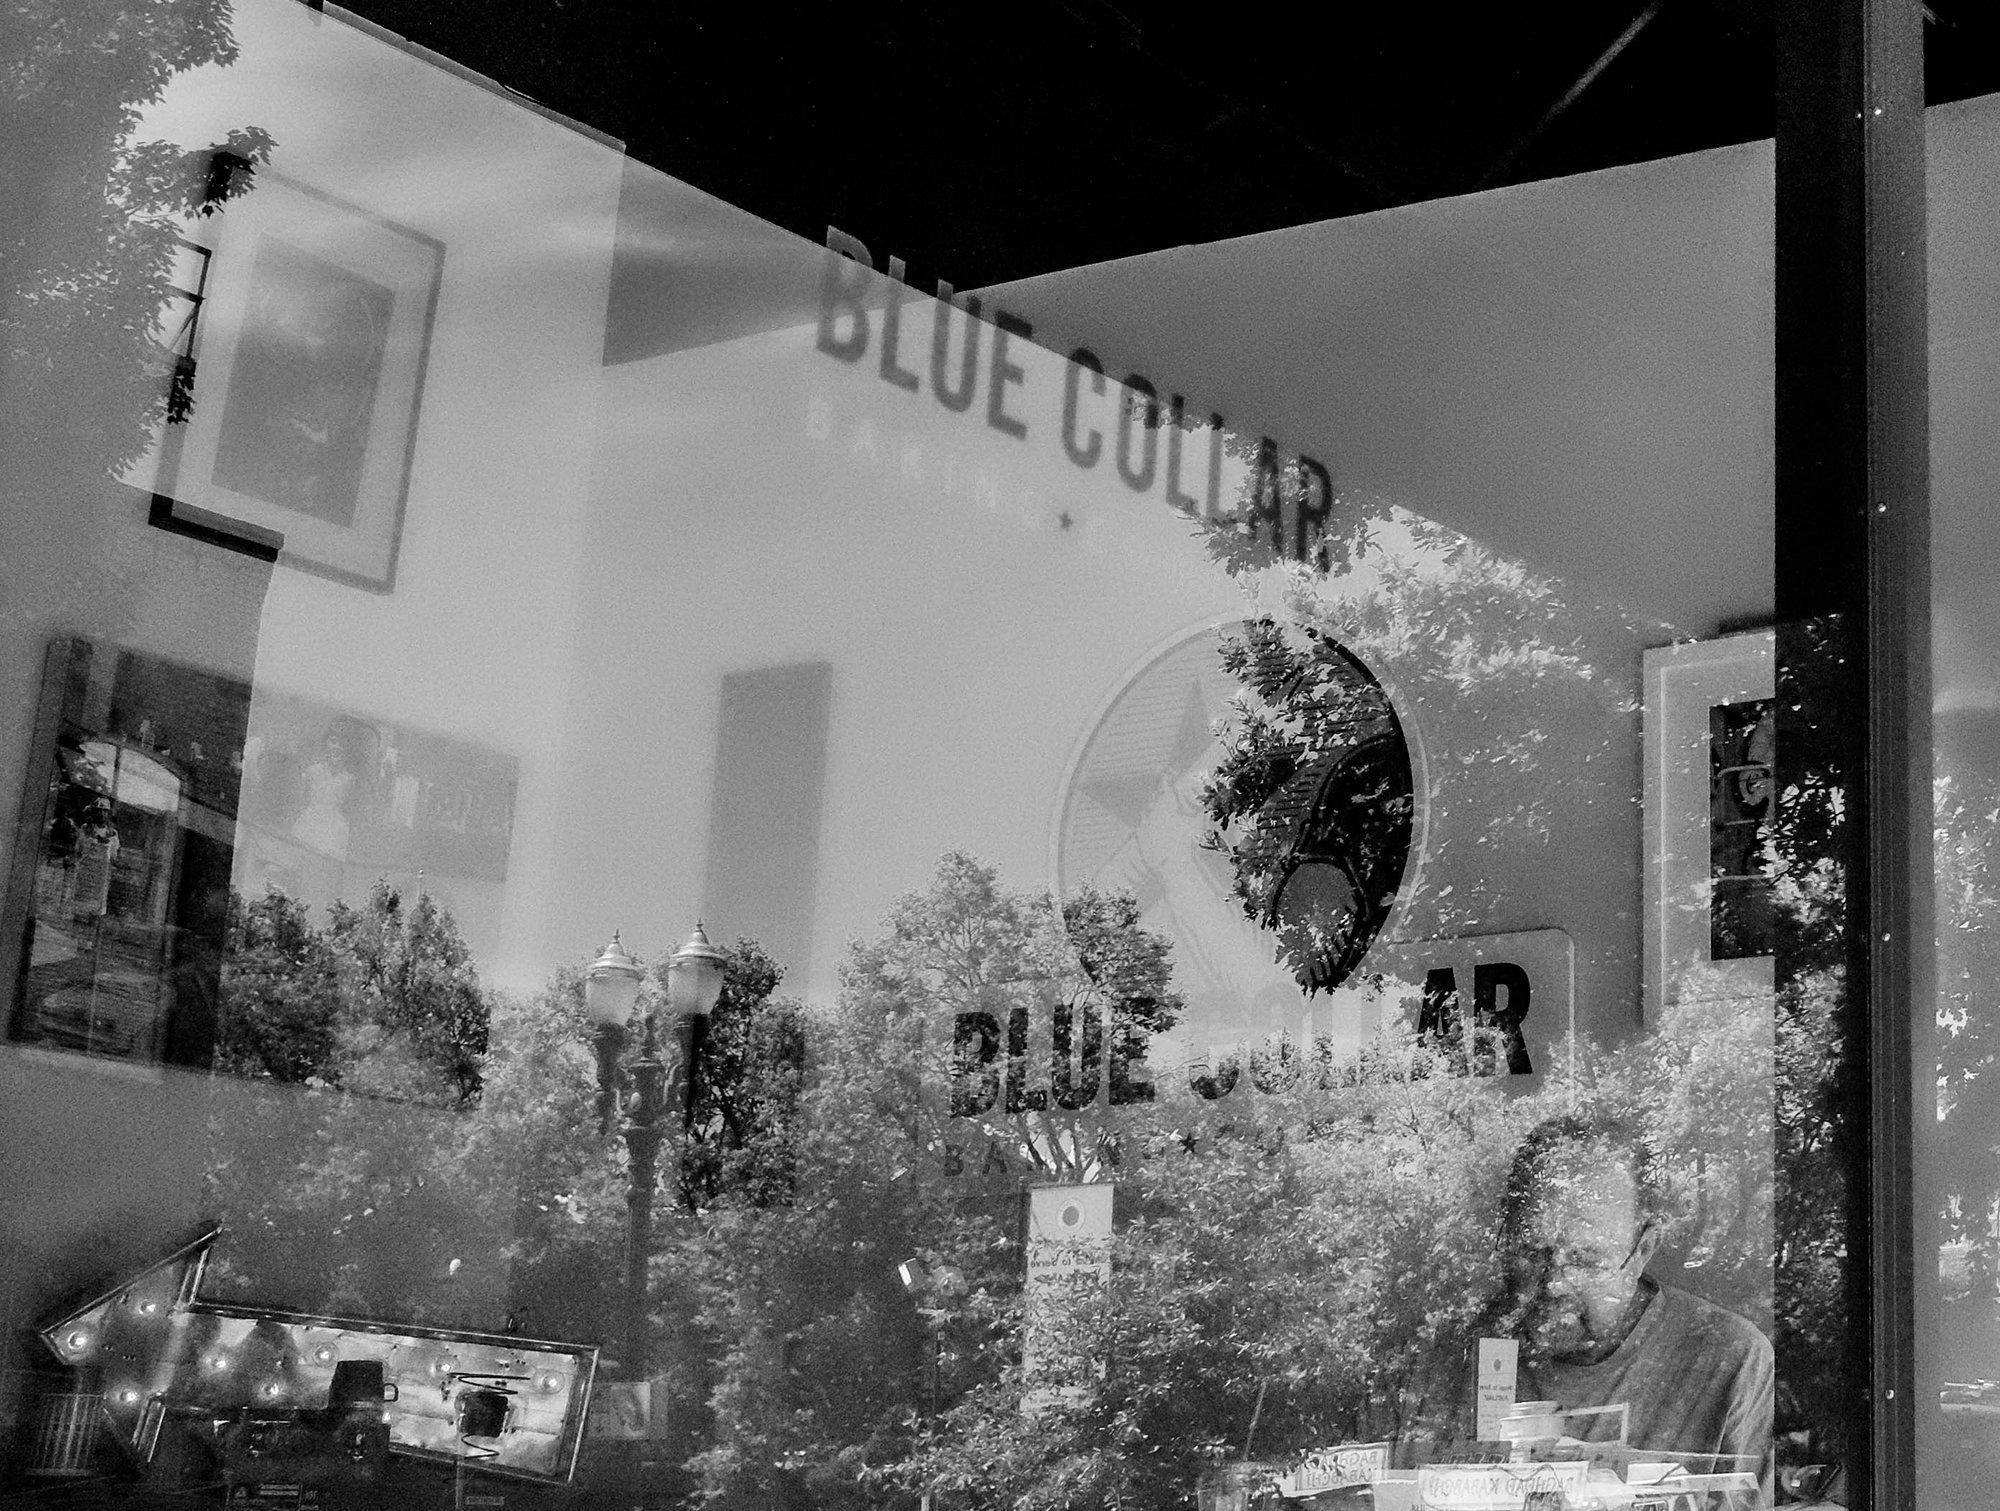 BlueCollar_Fujilove